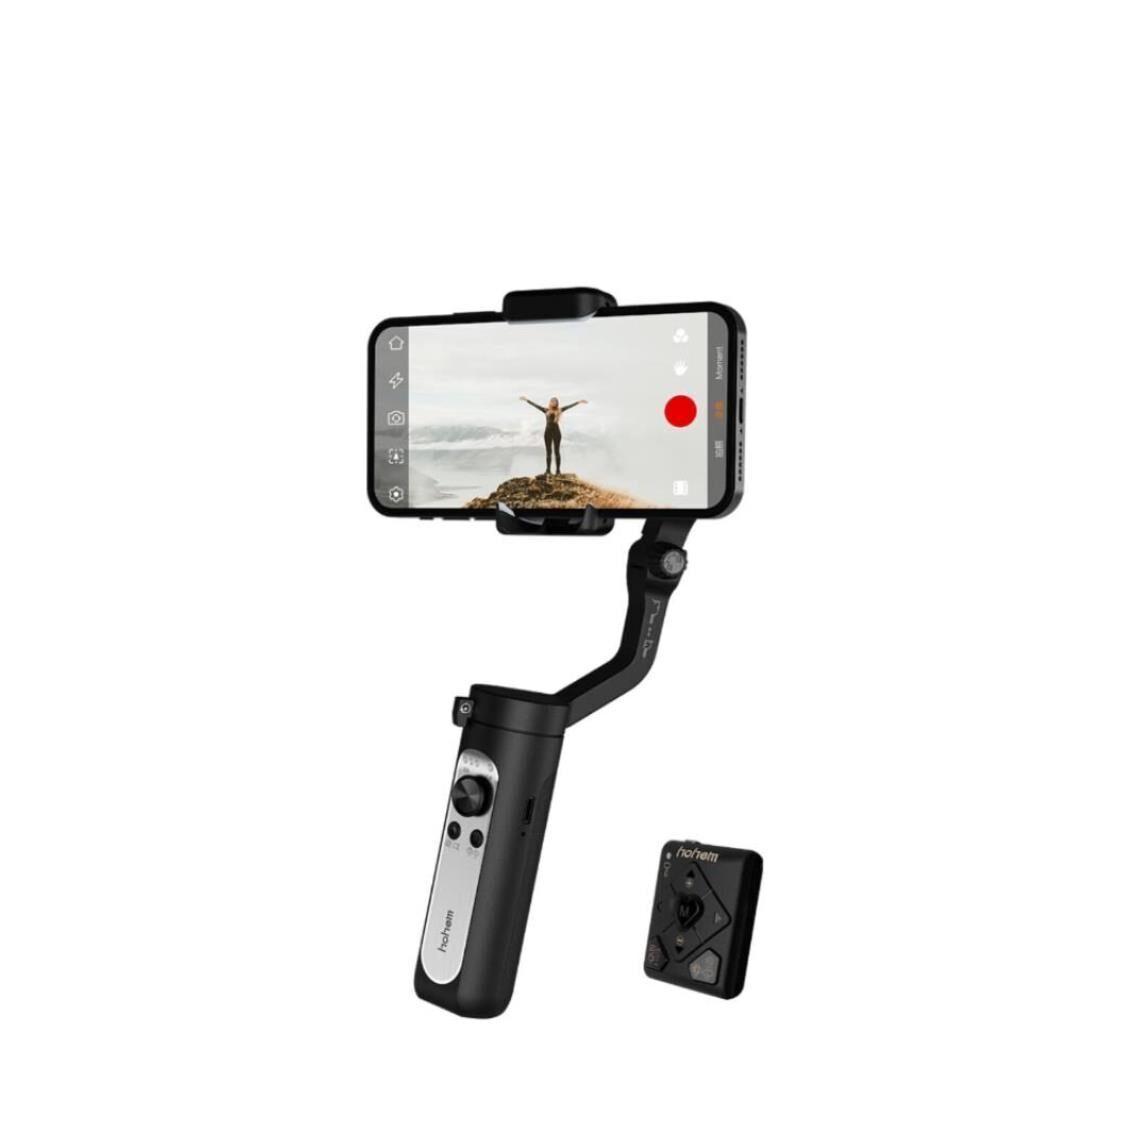 Hohem iSteady X2 3-Axis Smartphone Gimbal Stabilizer - Black